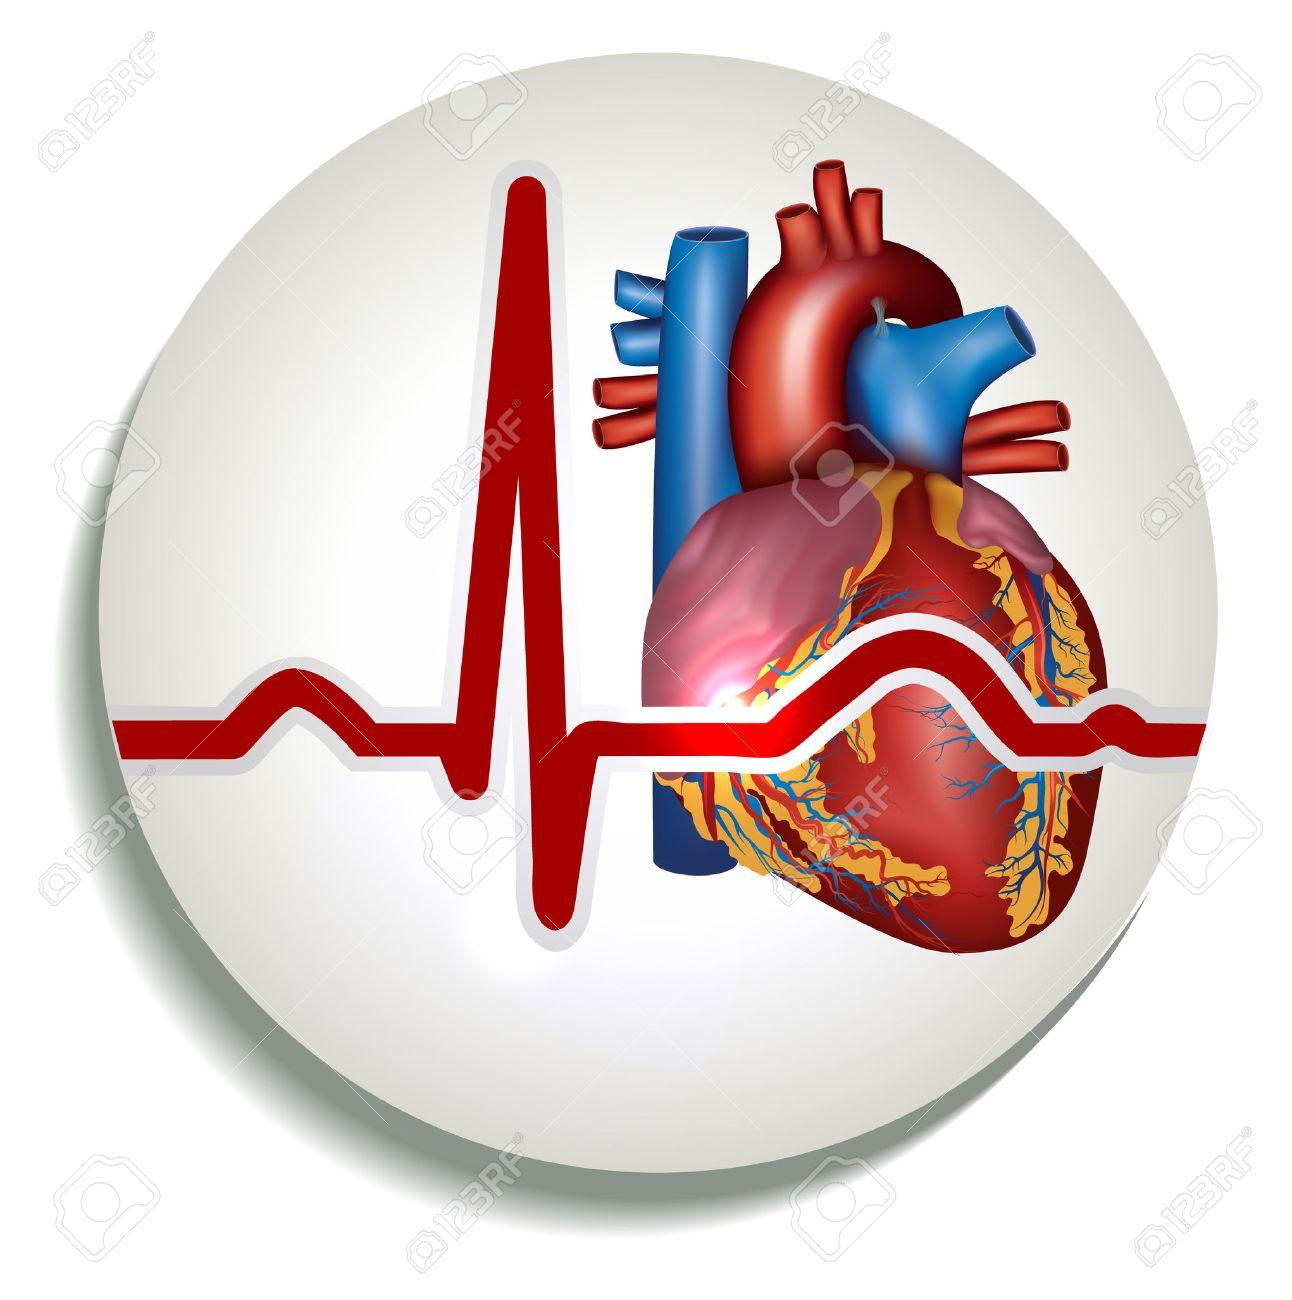 Colorful Human Heart Rhythm Icon. Human Heart Anatomy And Normal ...